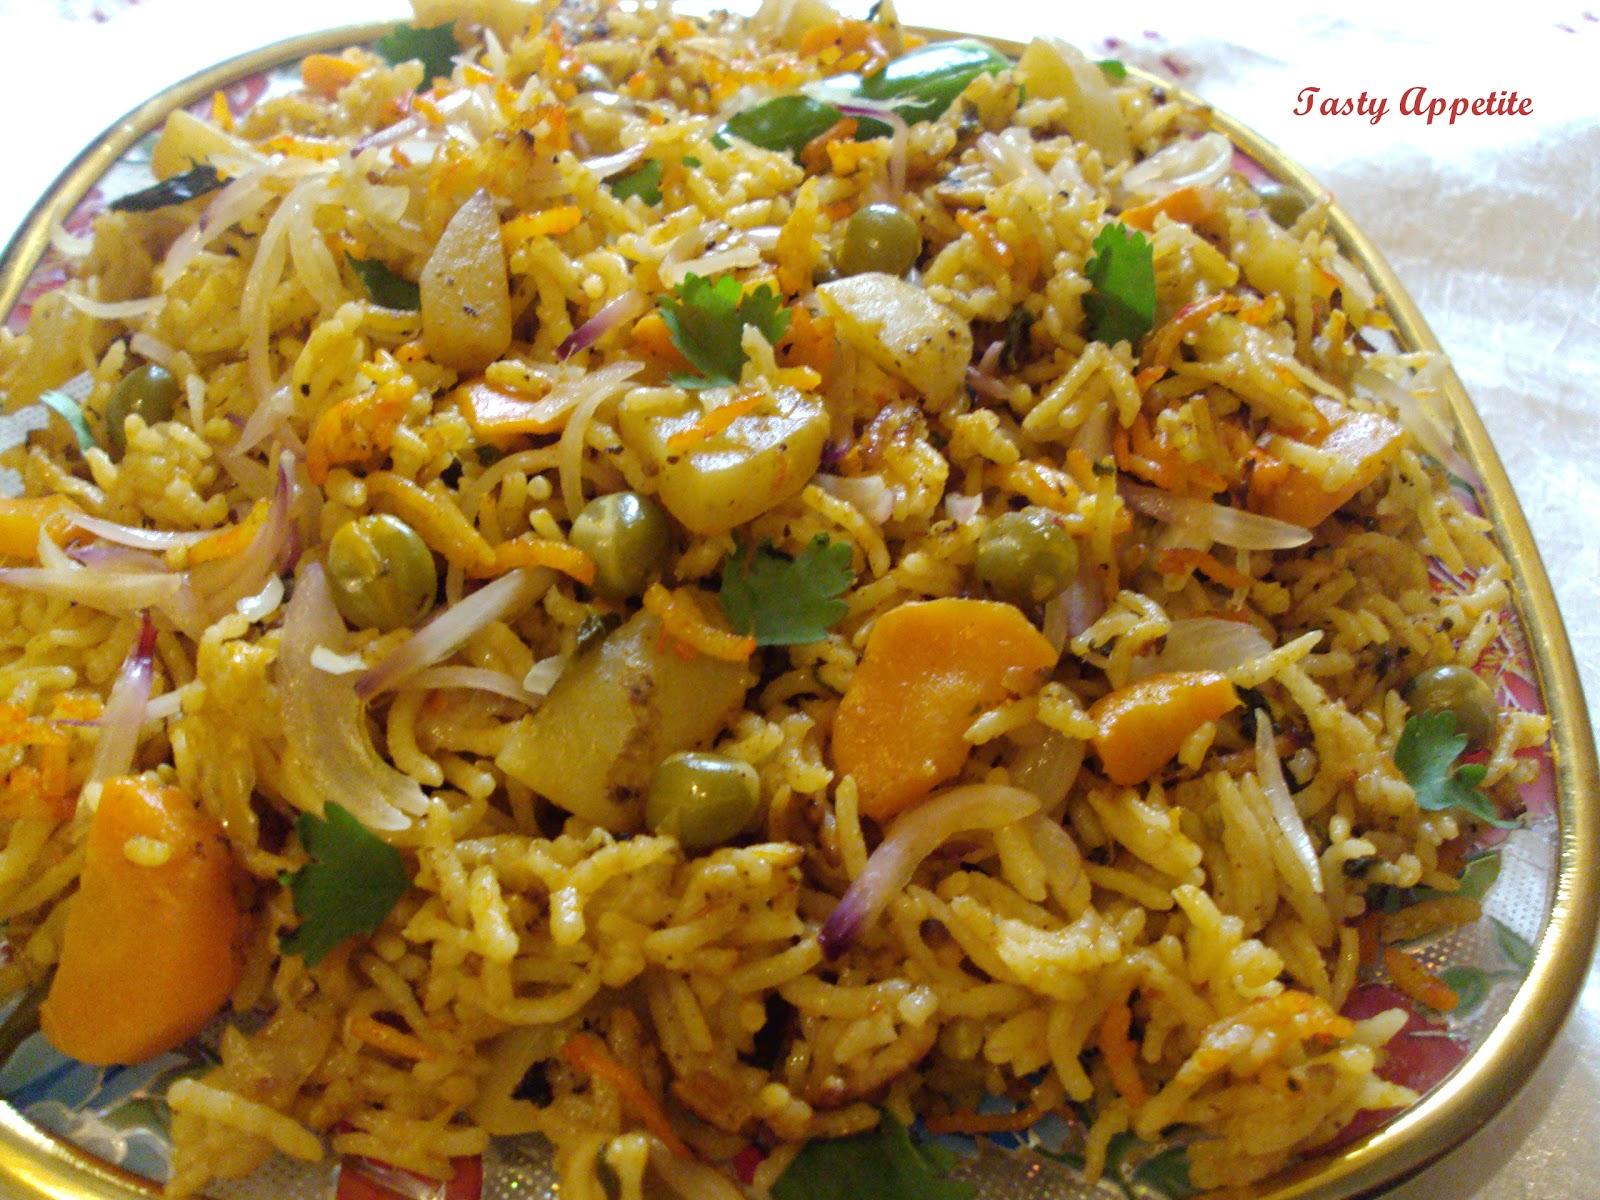 Hyderabadi Veg Dum Biryani: Like us on Youtube formore Video Recipes